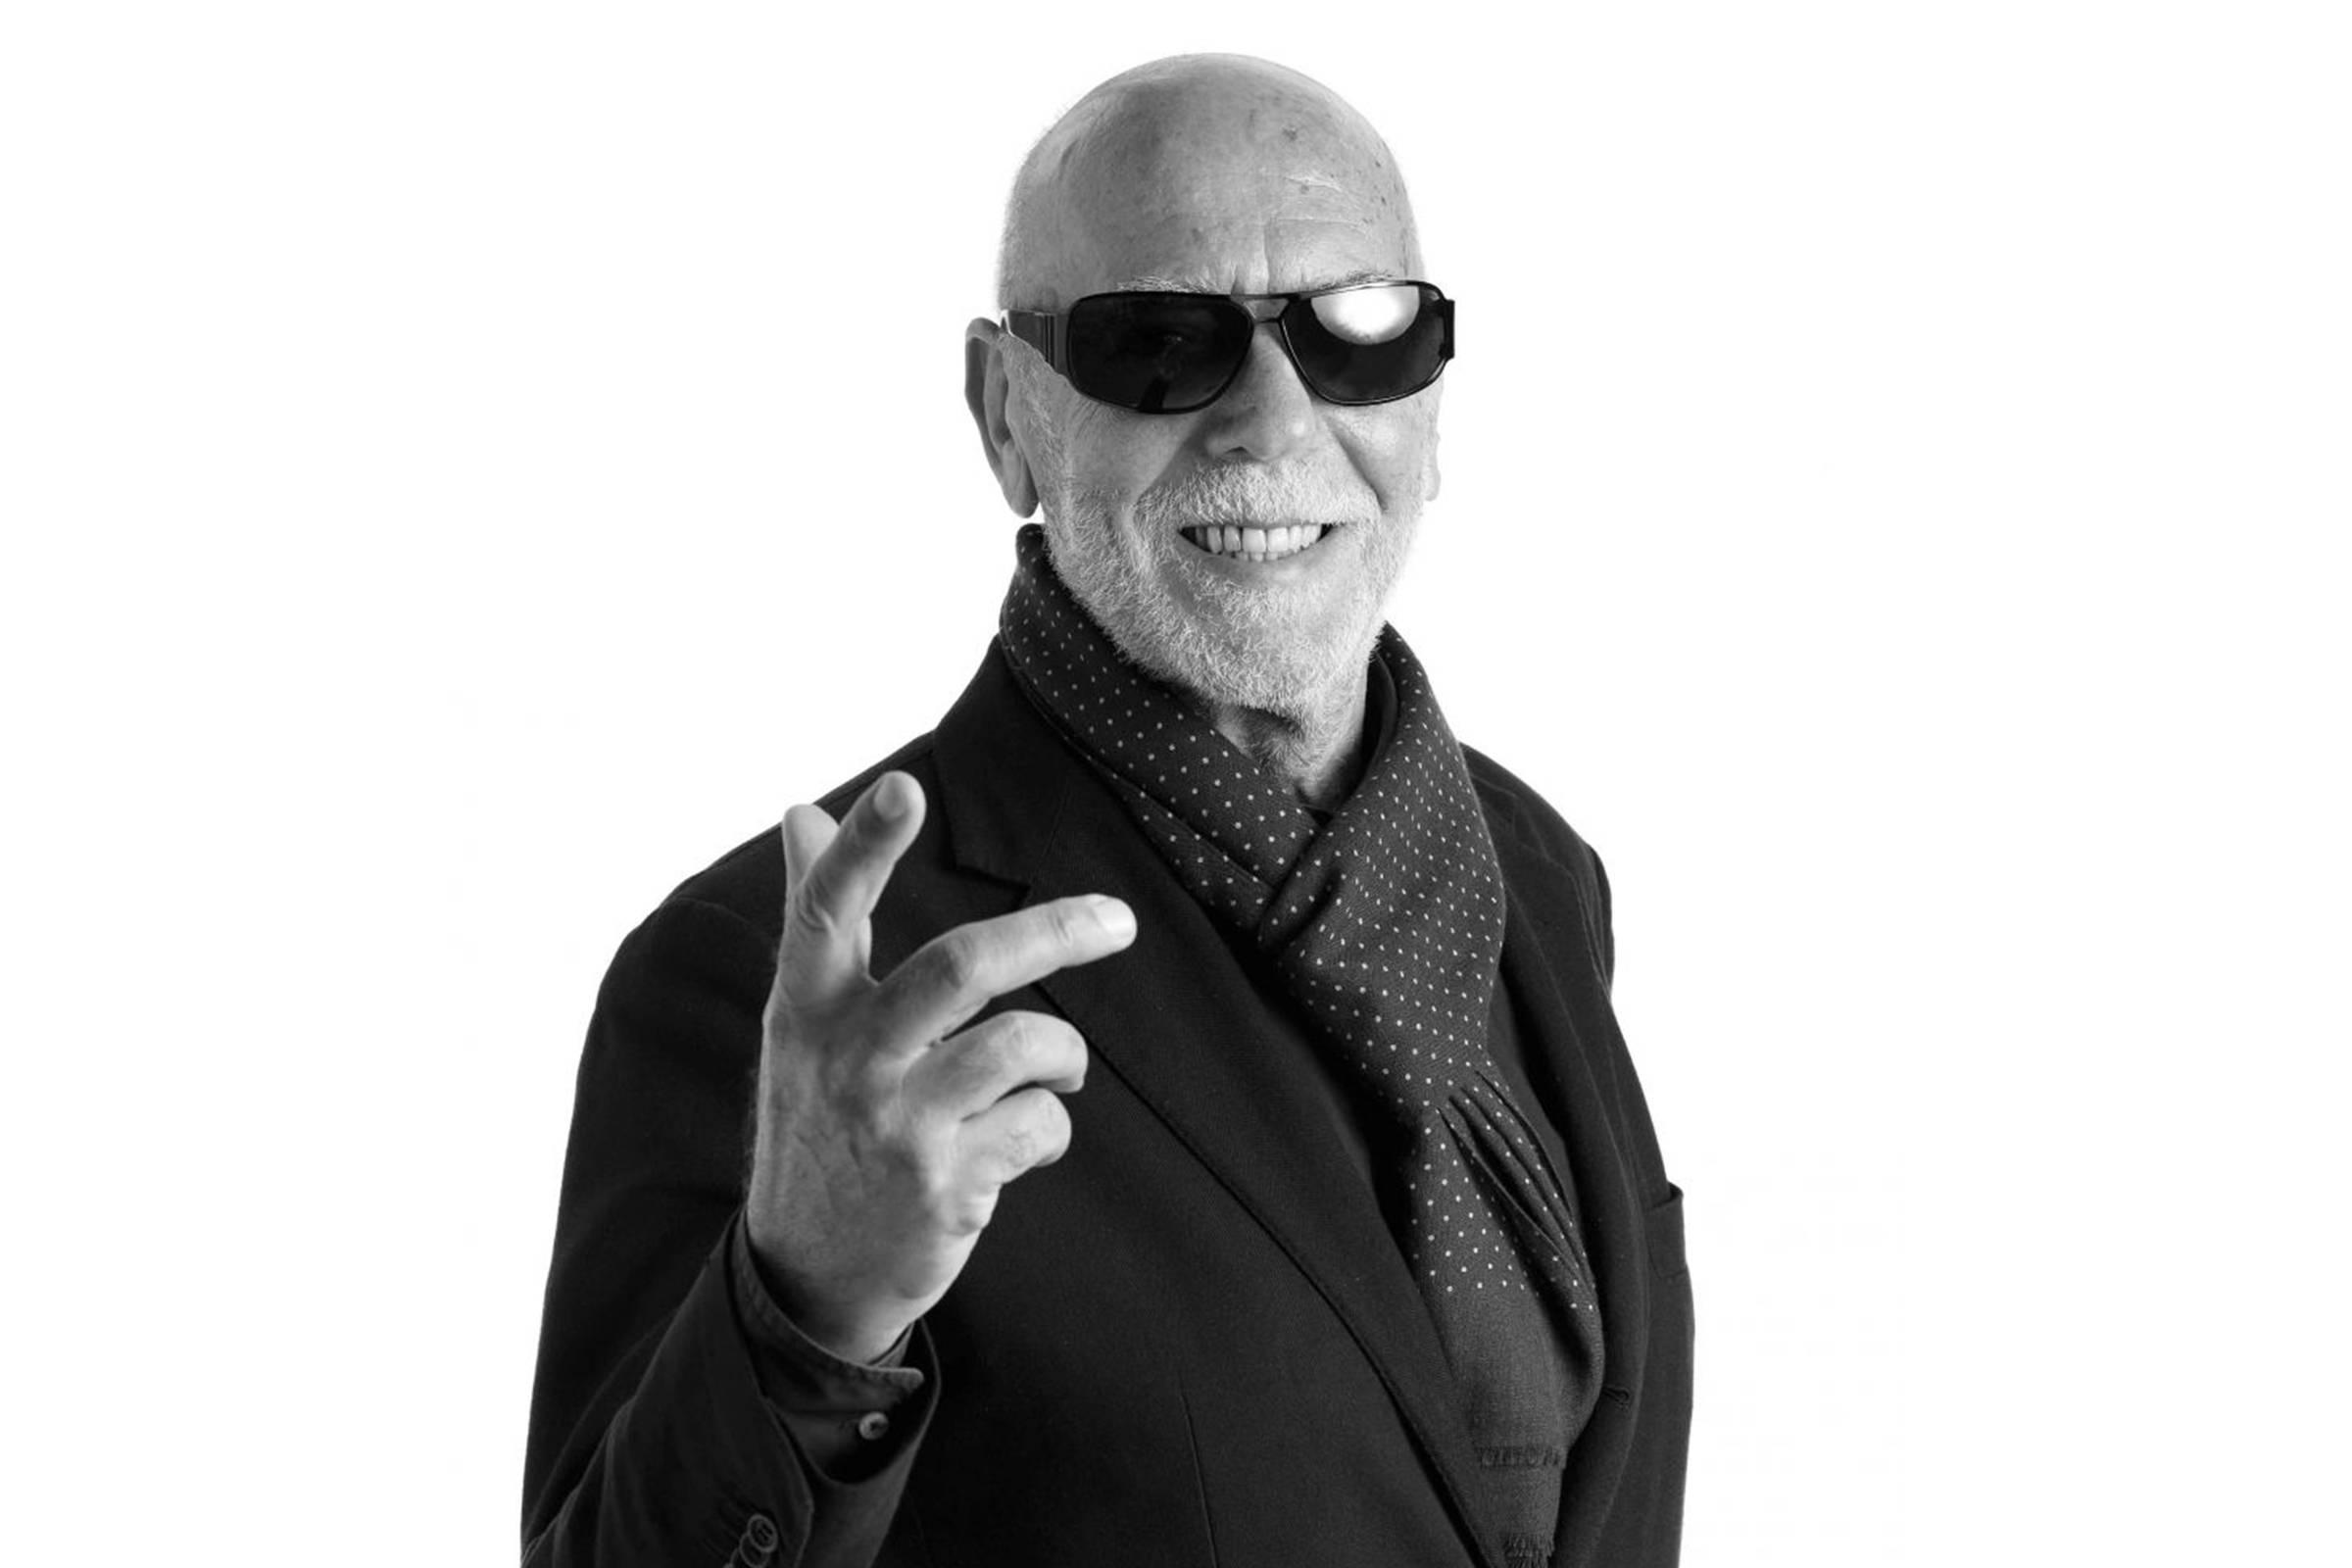 Barena Venezia founder Sandro Zara